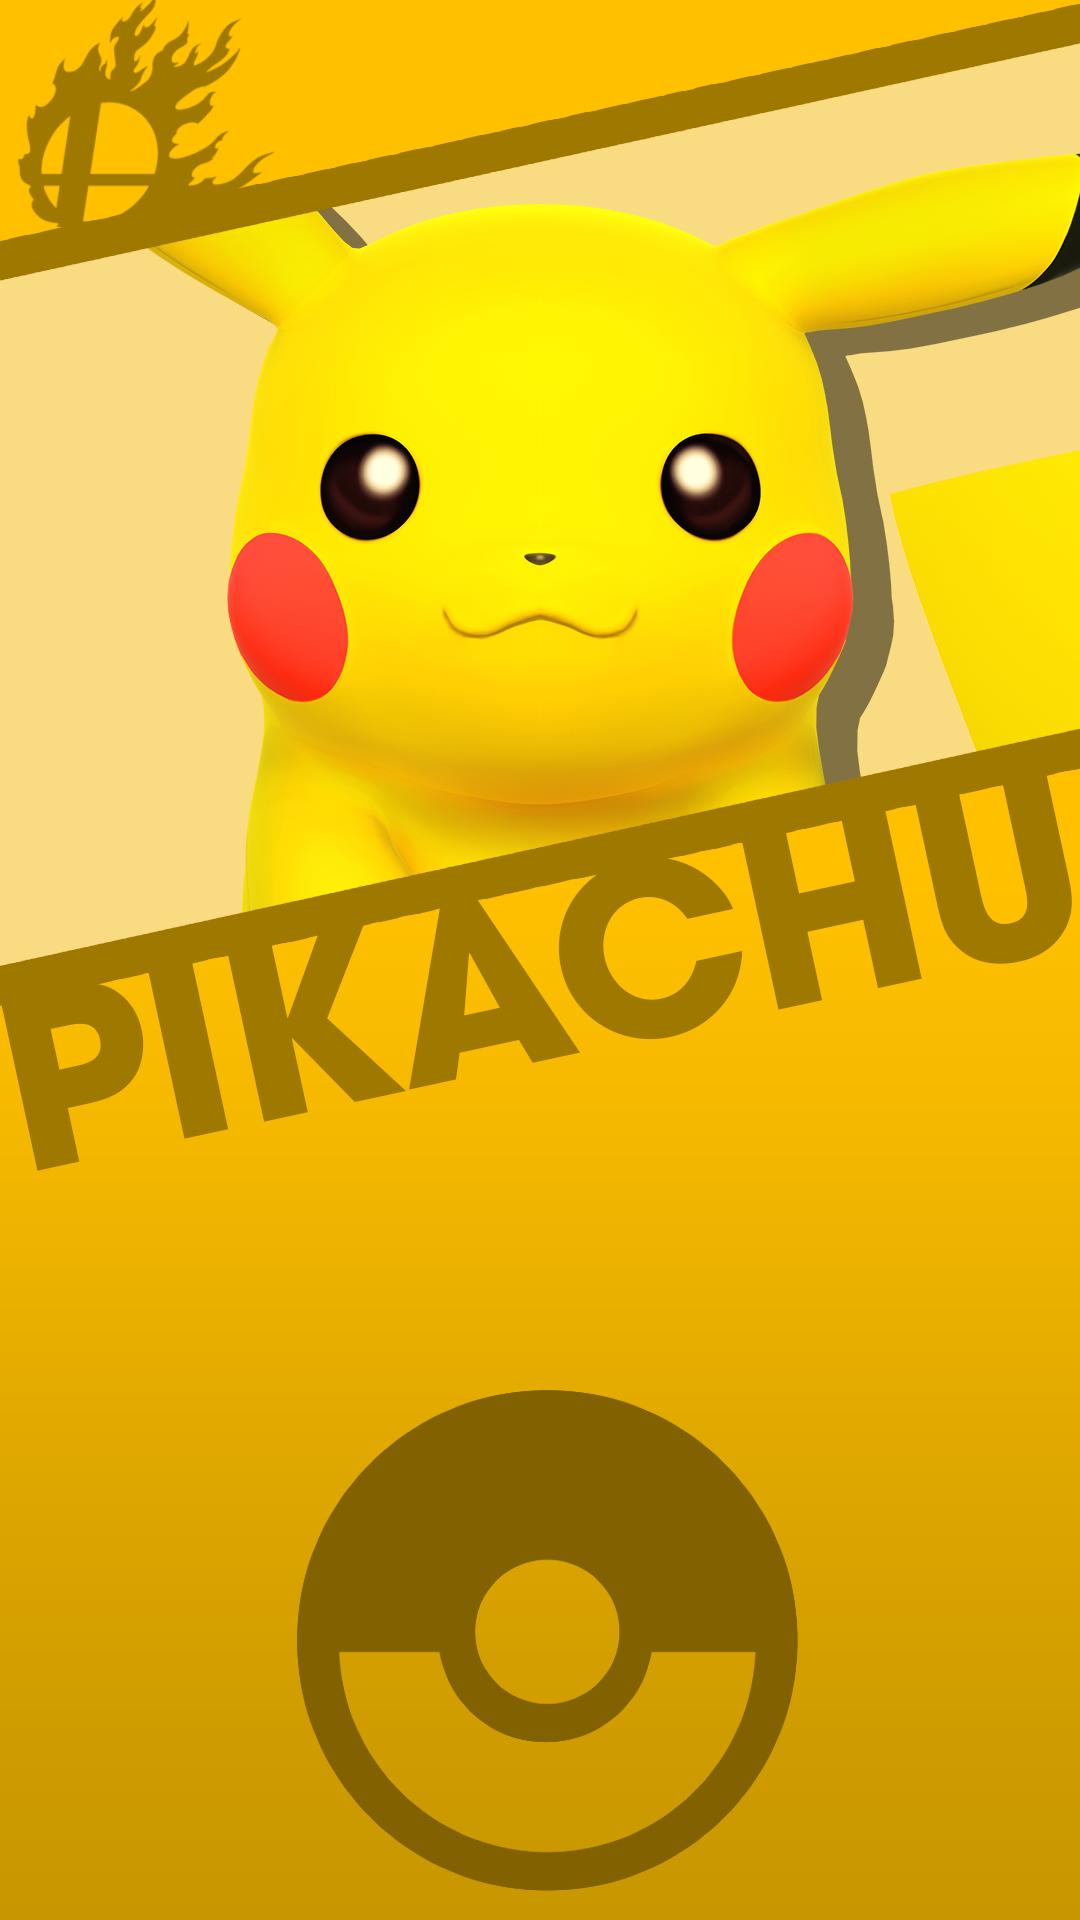 video game pokemon iphone backgrounds Pikachu wallpaper